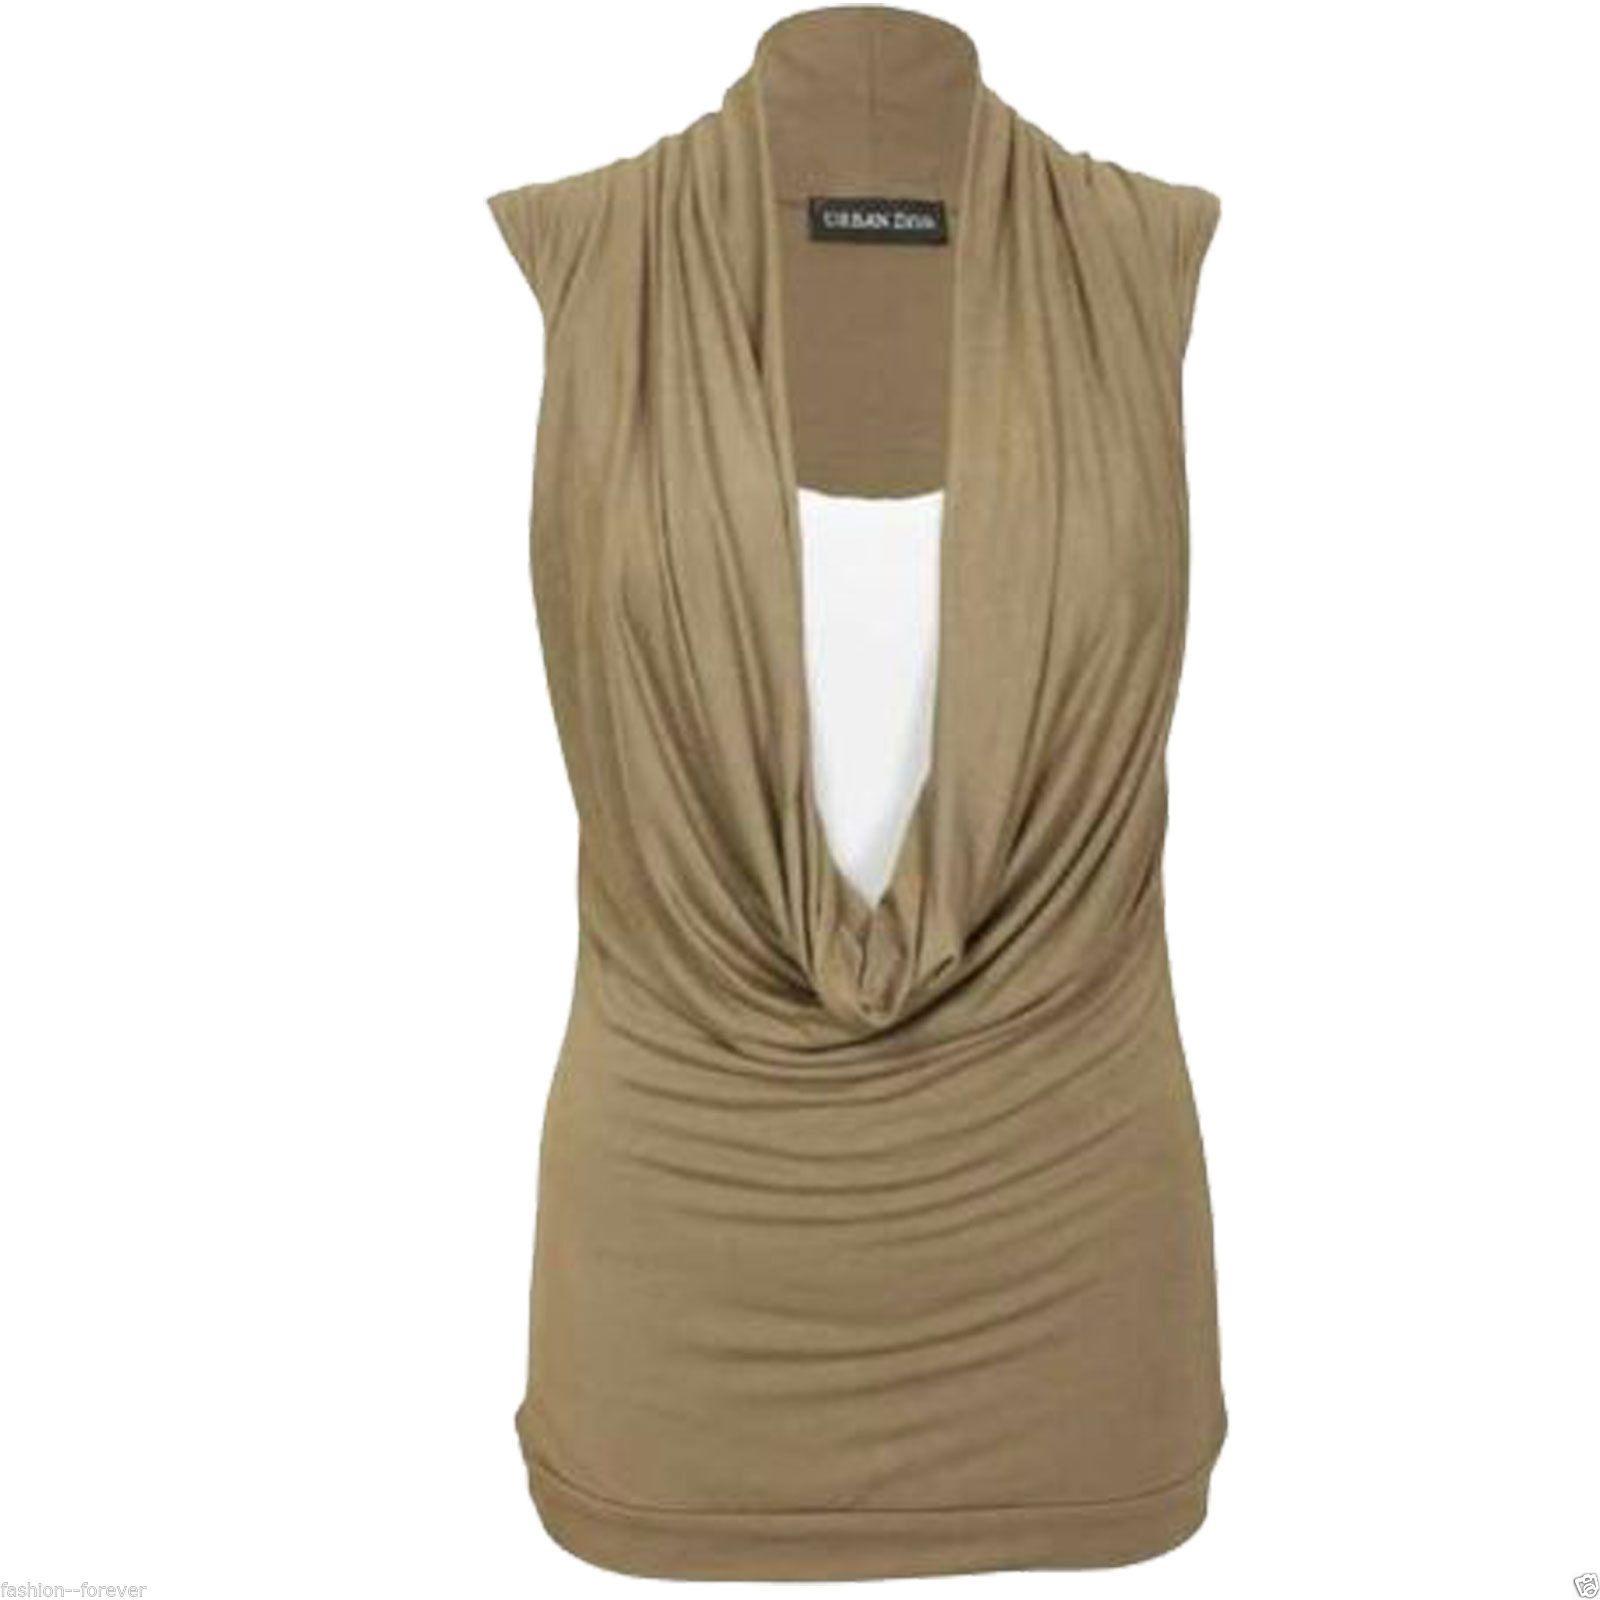 12d21bf626136 Ladies Women Gathered Cowl Neck Top Vest Sleeveless Deep Neck Top Blouse